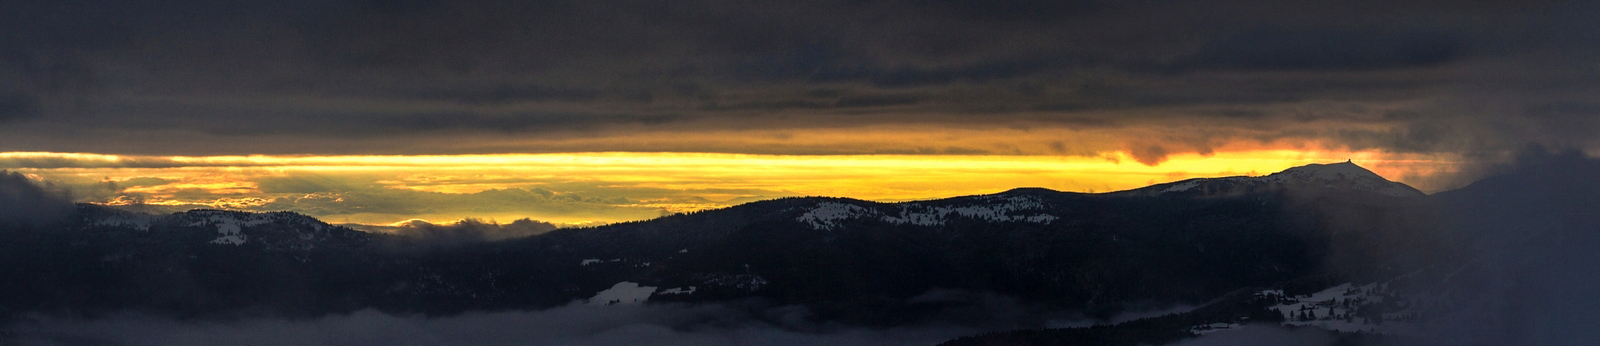 Samedi 12 novembre 2016. Lever du soleil au Hohneck (Hautes Vosges)